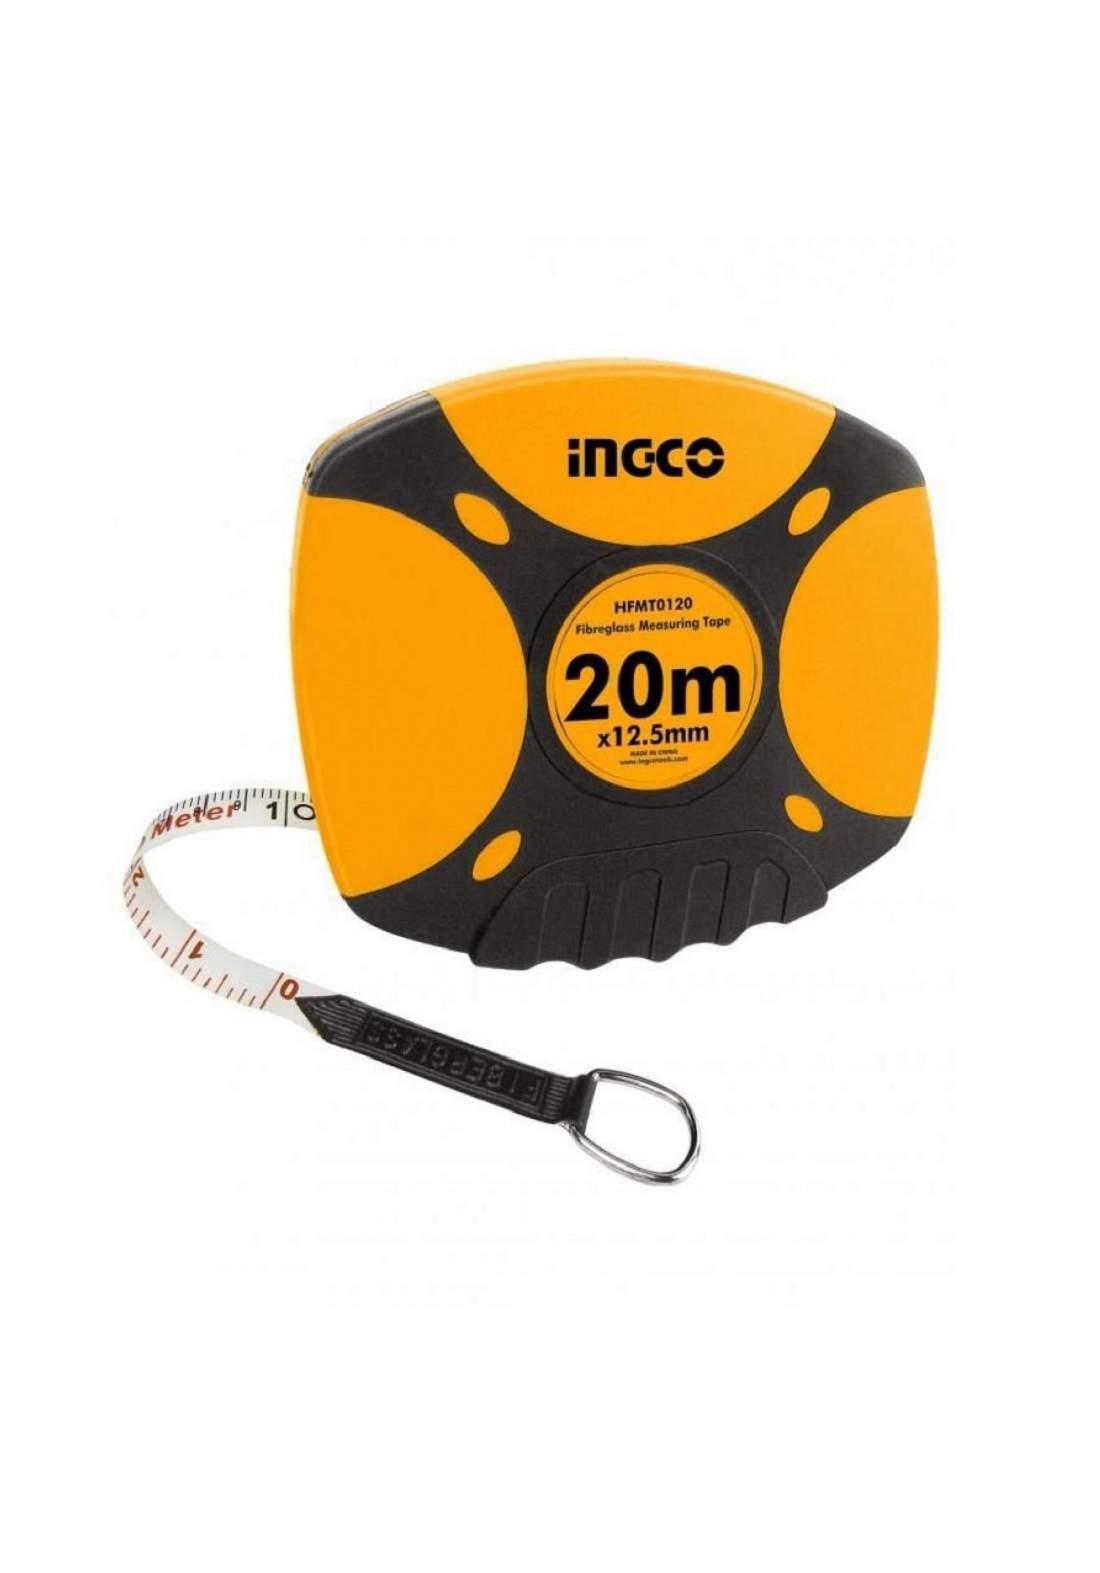 INGCO HFMT0120 Fibreglass Measuring Tape 20M فيته قماش 20 متر